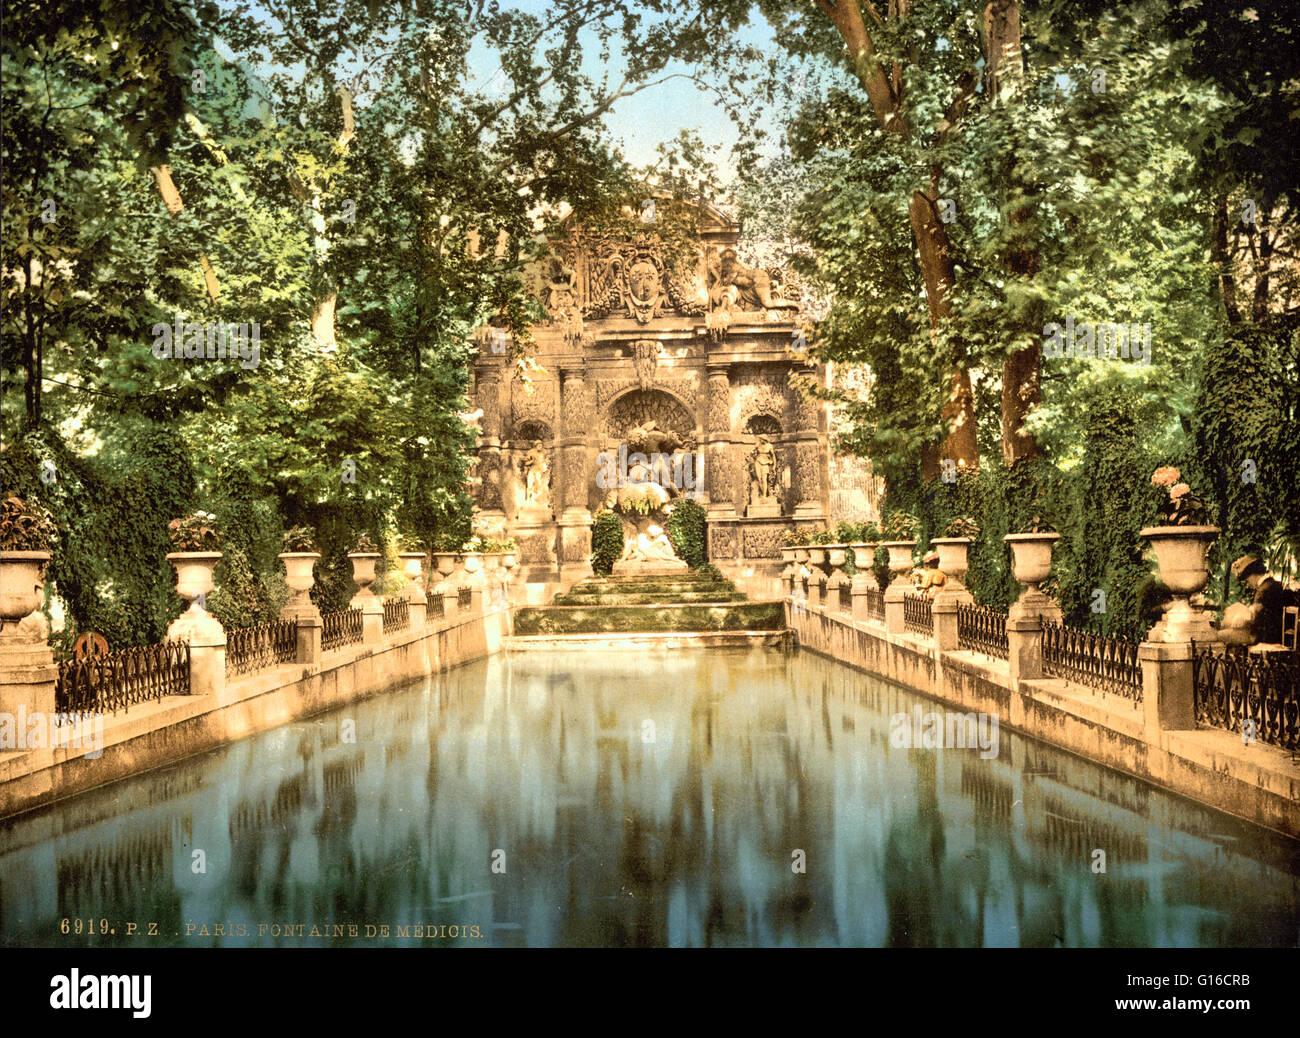 Giardini di lussemburgo i medici fontane parigi francia circa